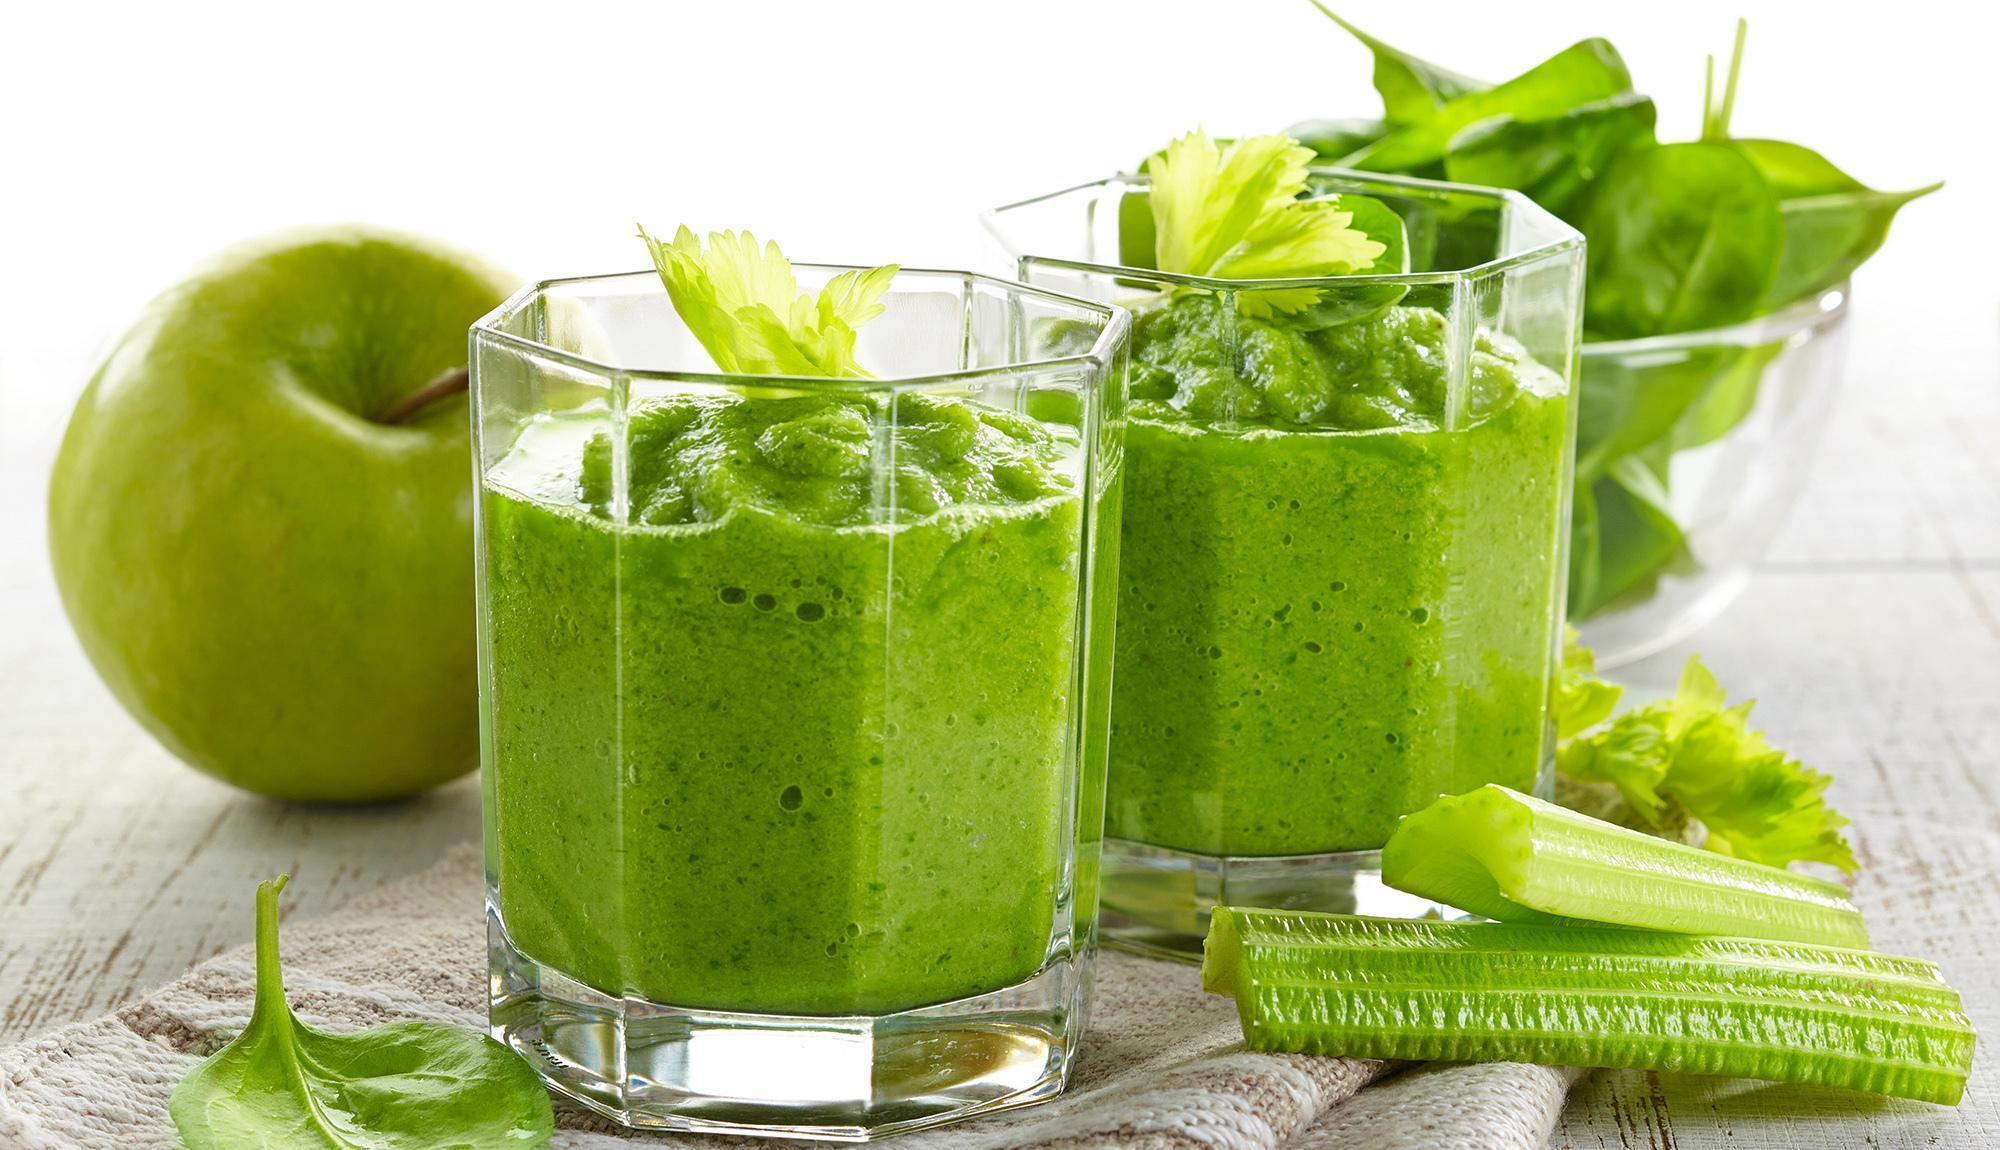 6 Receitas de Sucos Verdes Para Queimar Gordura Abdominal